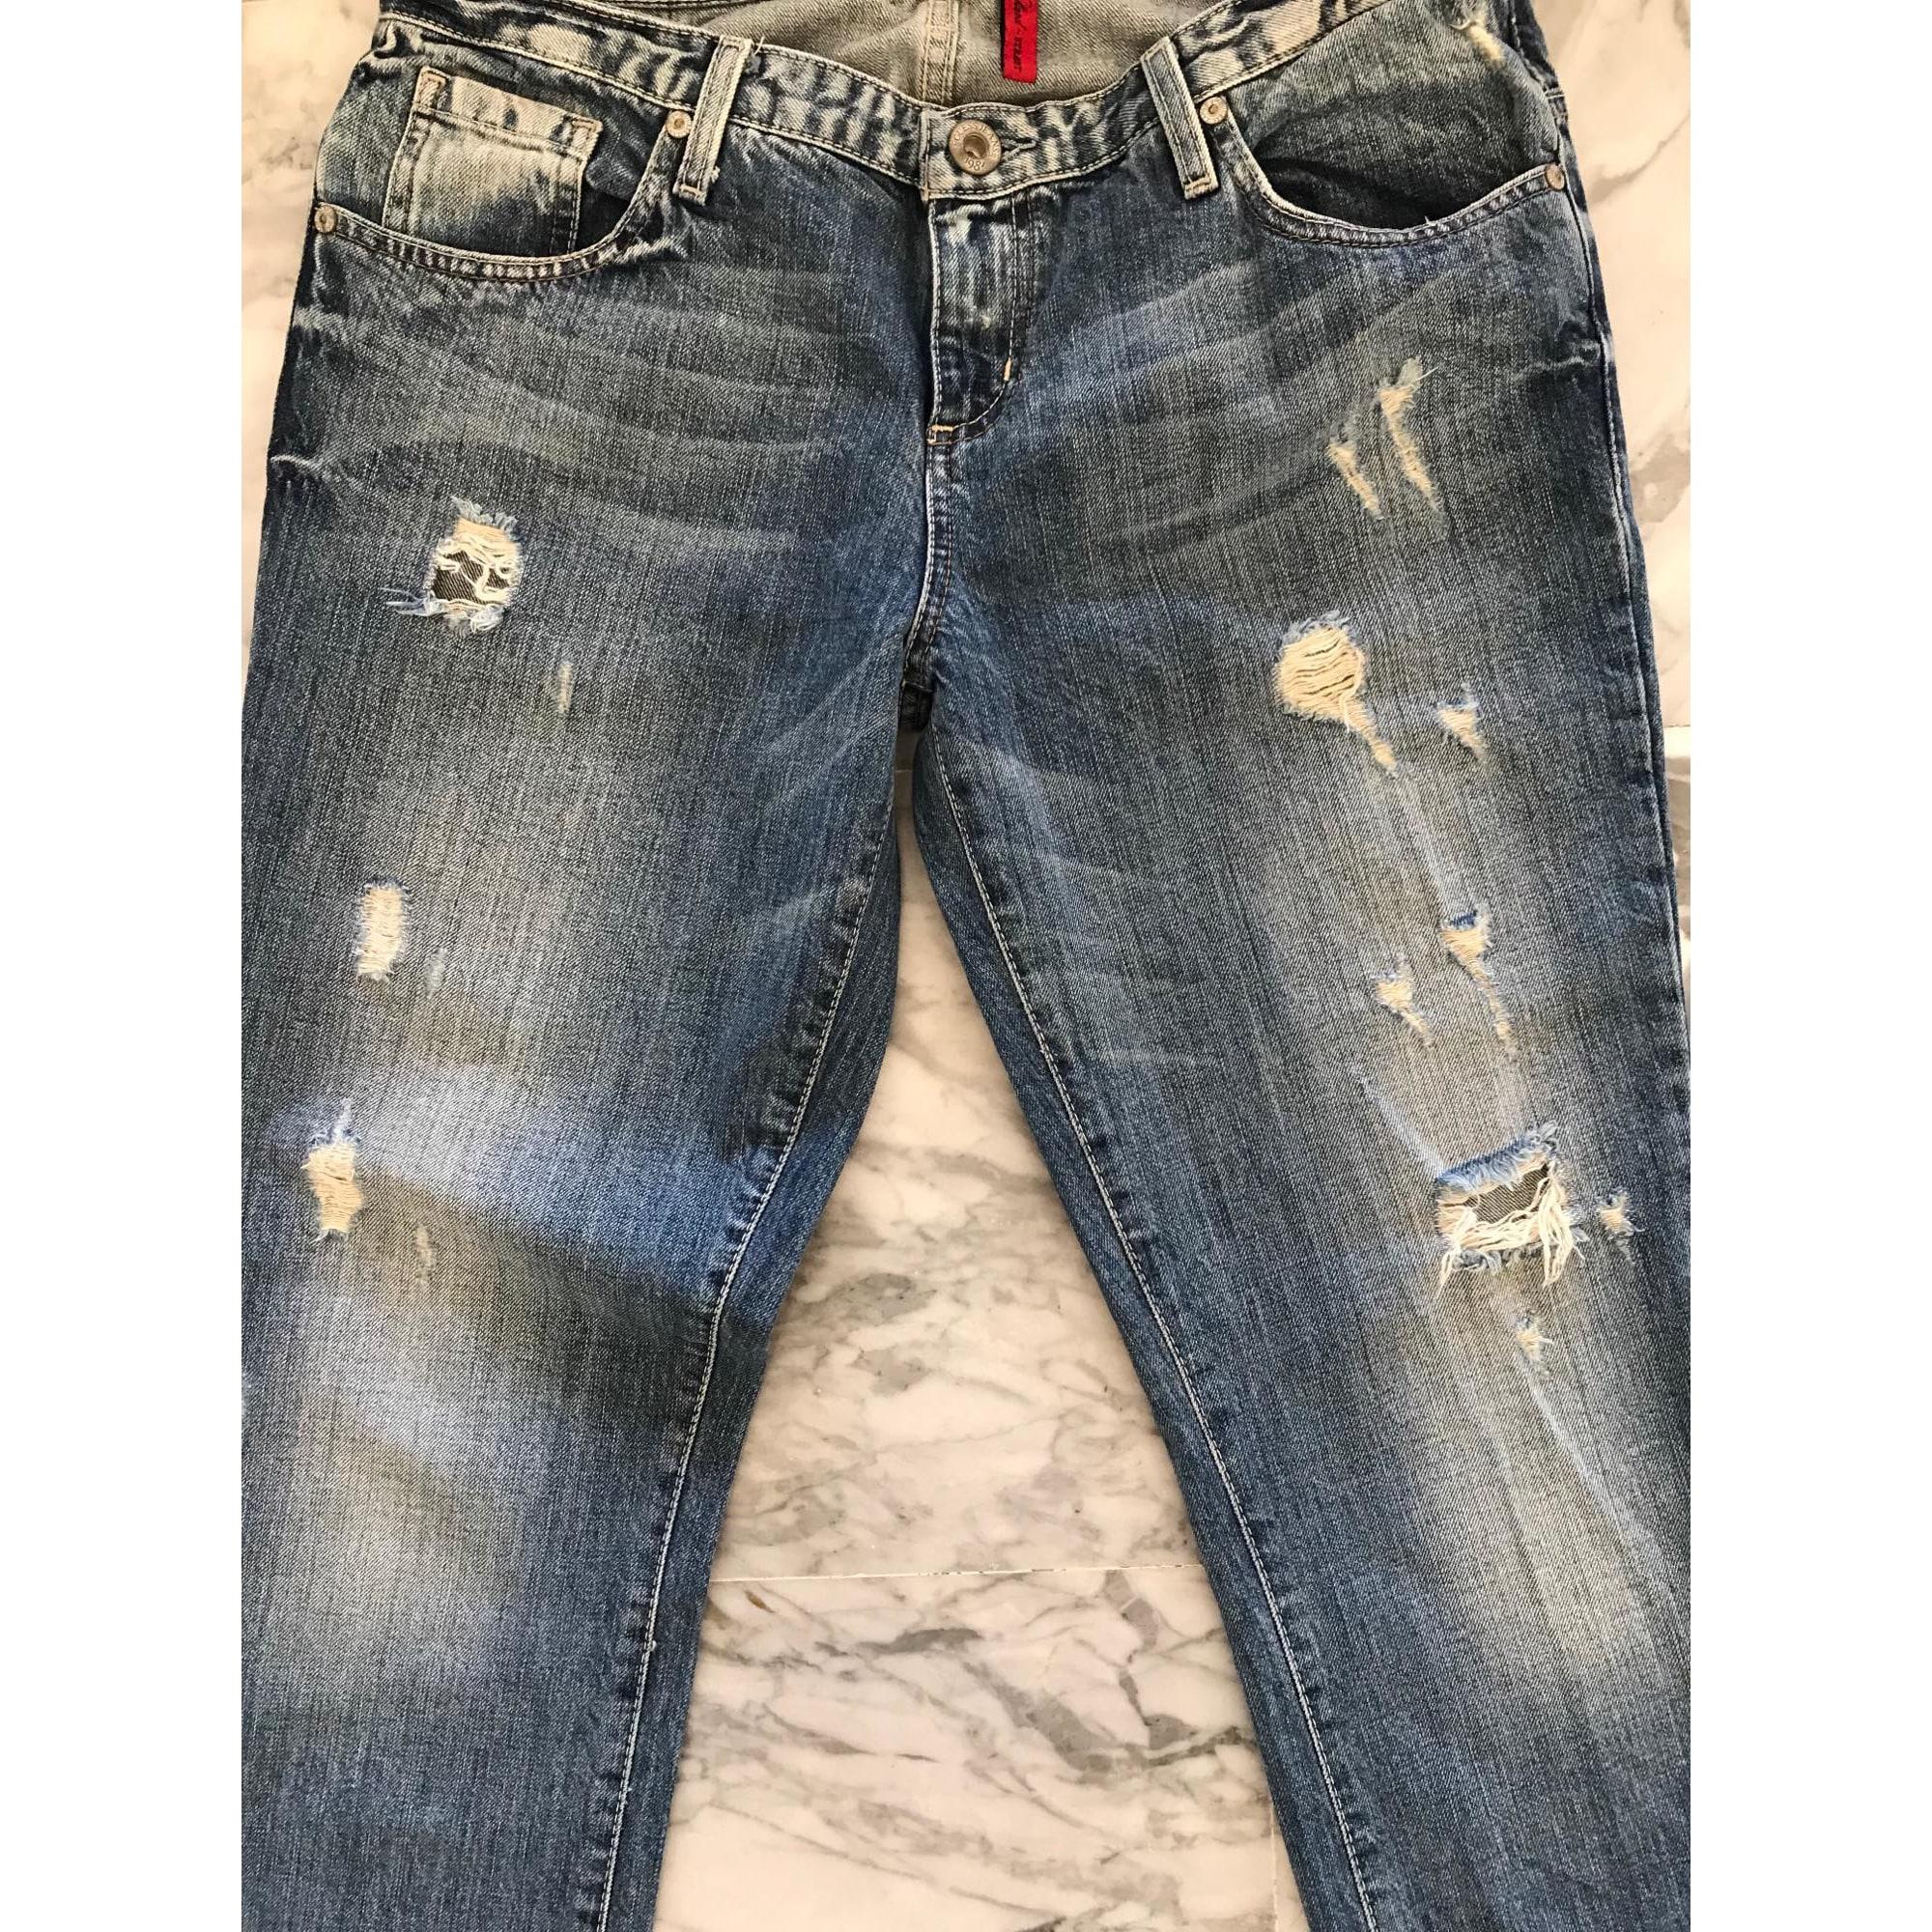 Jeans large, boyfriend GUESS Bleu, bleu marine, bleu turquoise